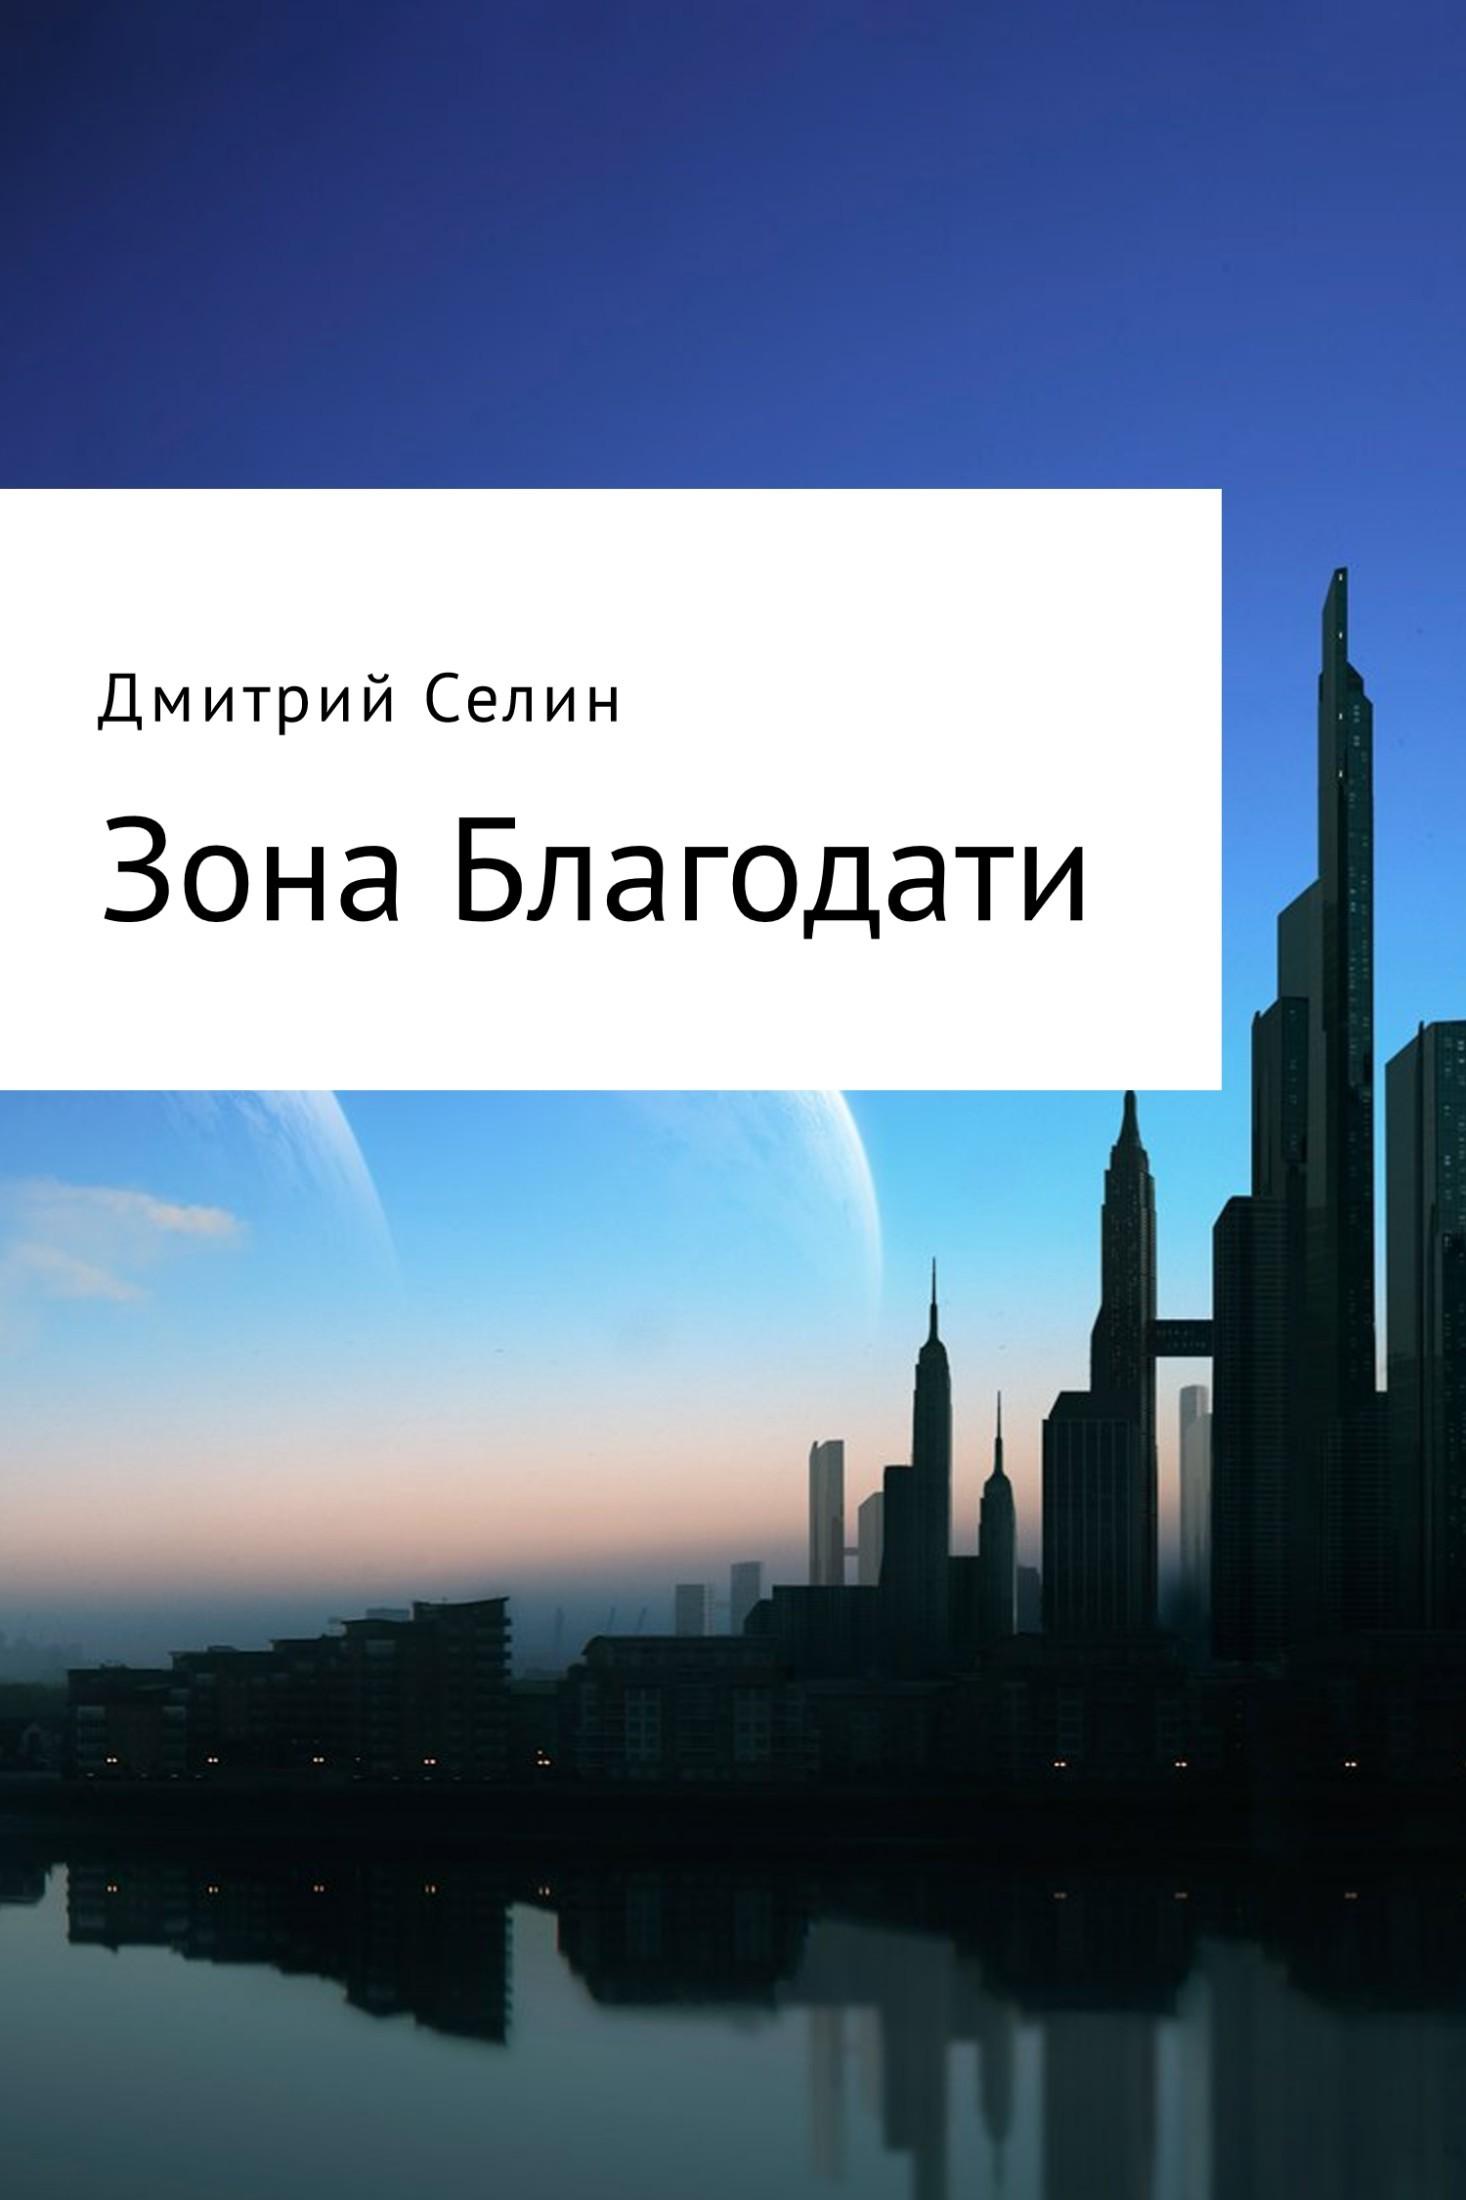 Дмитрий Селин - Зона Благодати